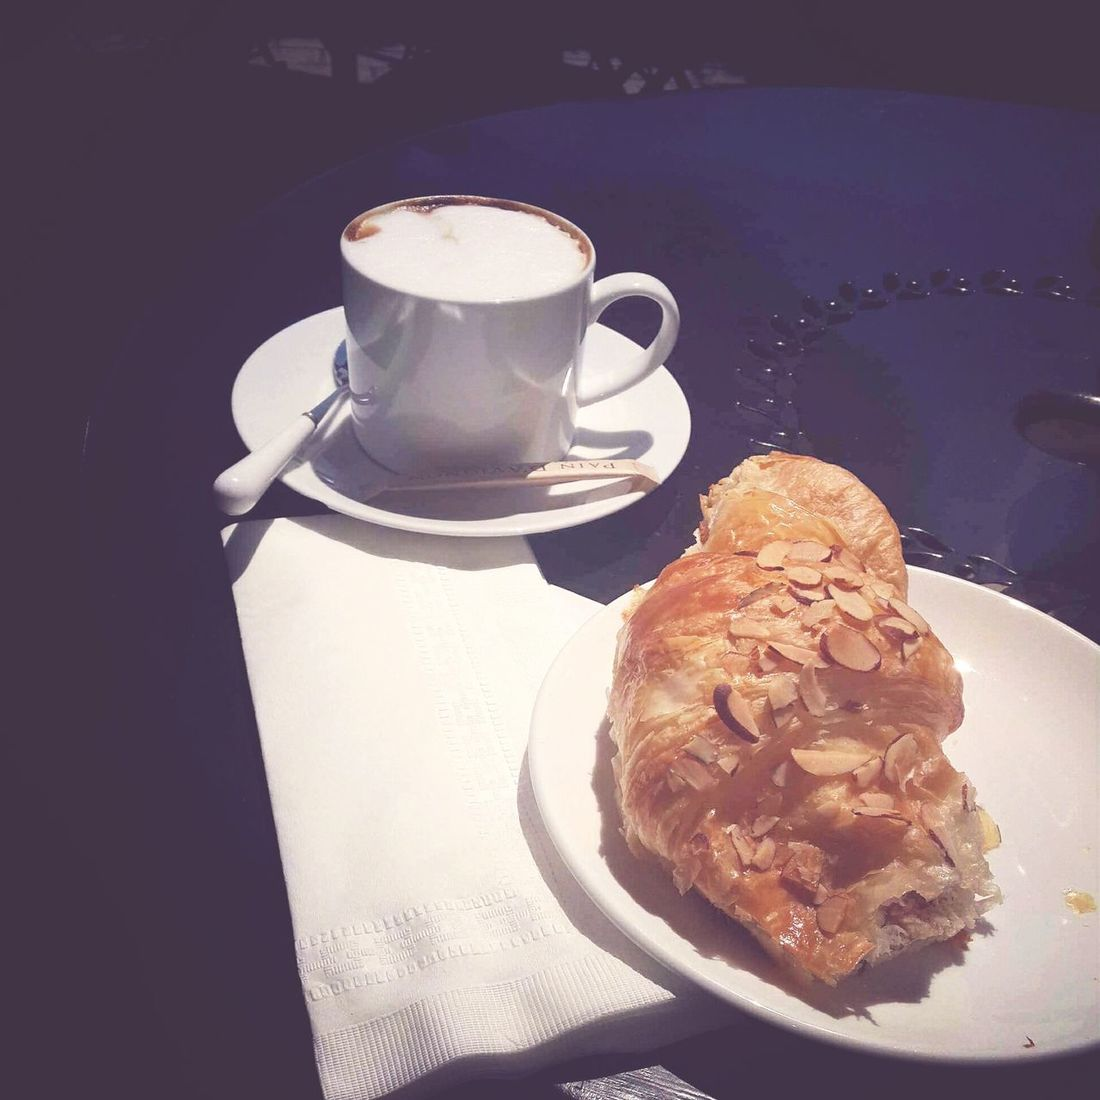 Food Porn Awards The perfect breakfast! Capuccino Almond Croasant Sunnyday Goodmorning :)